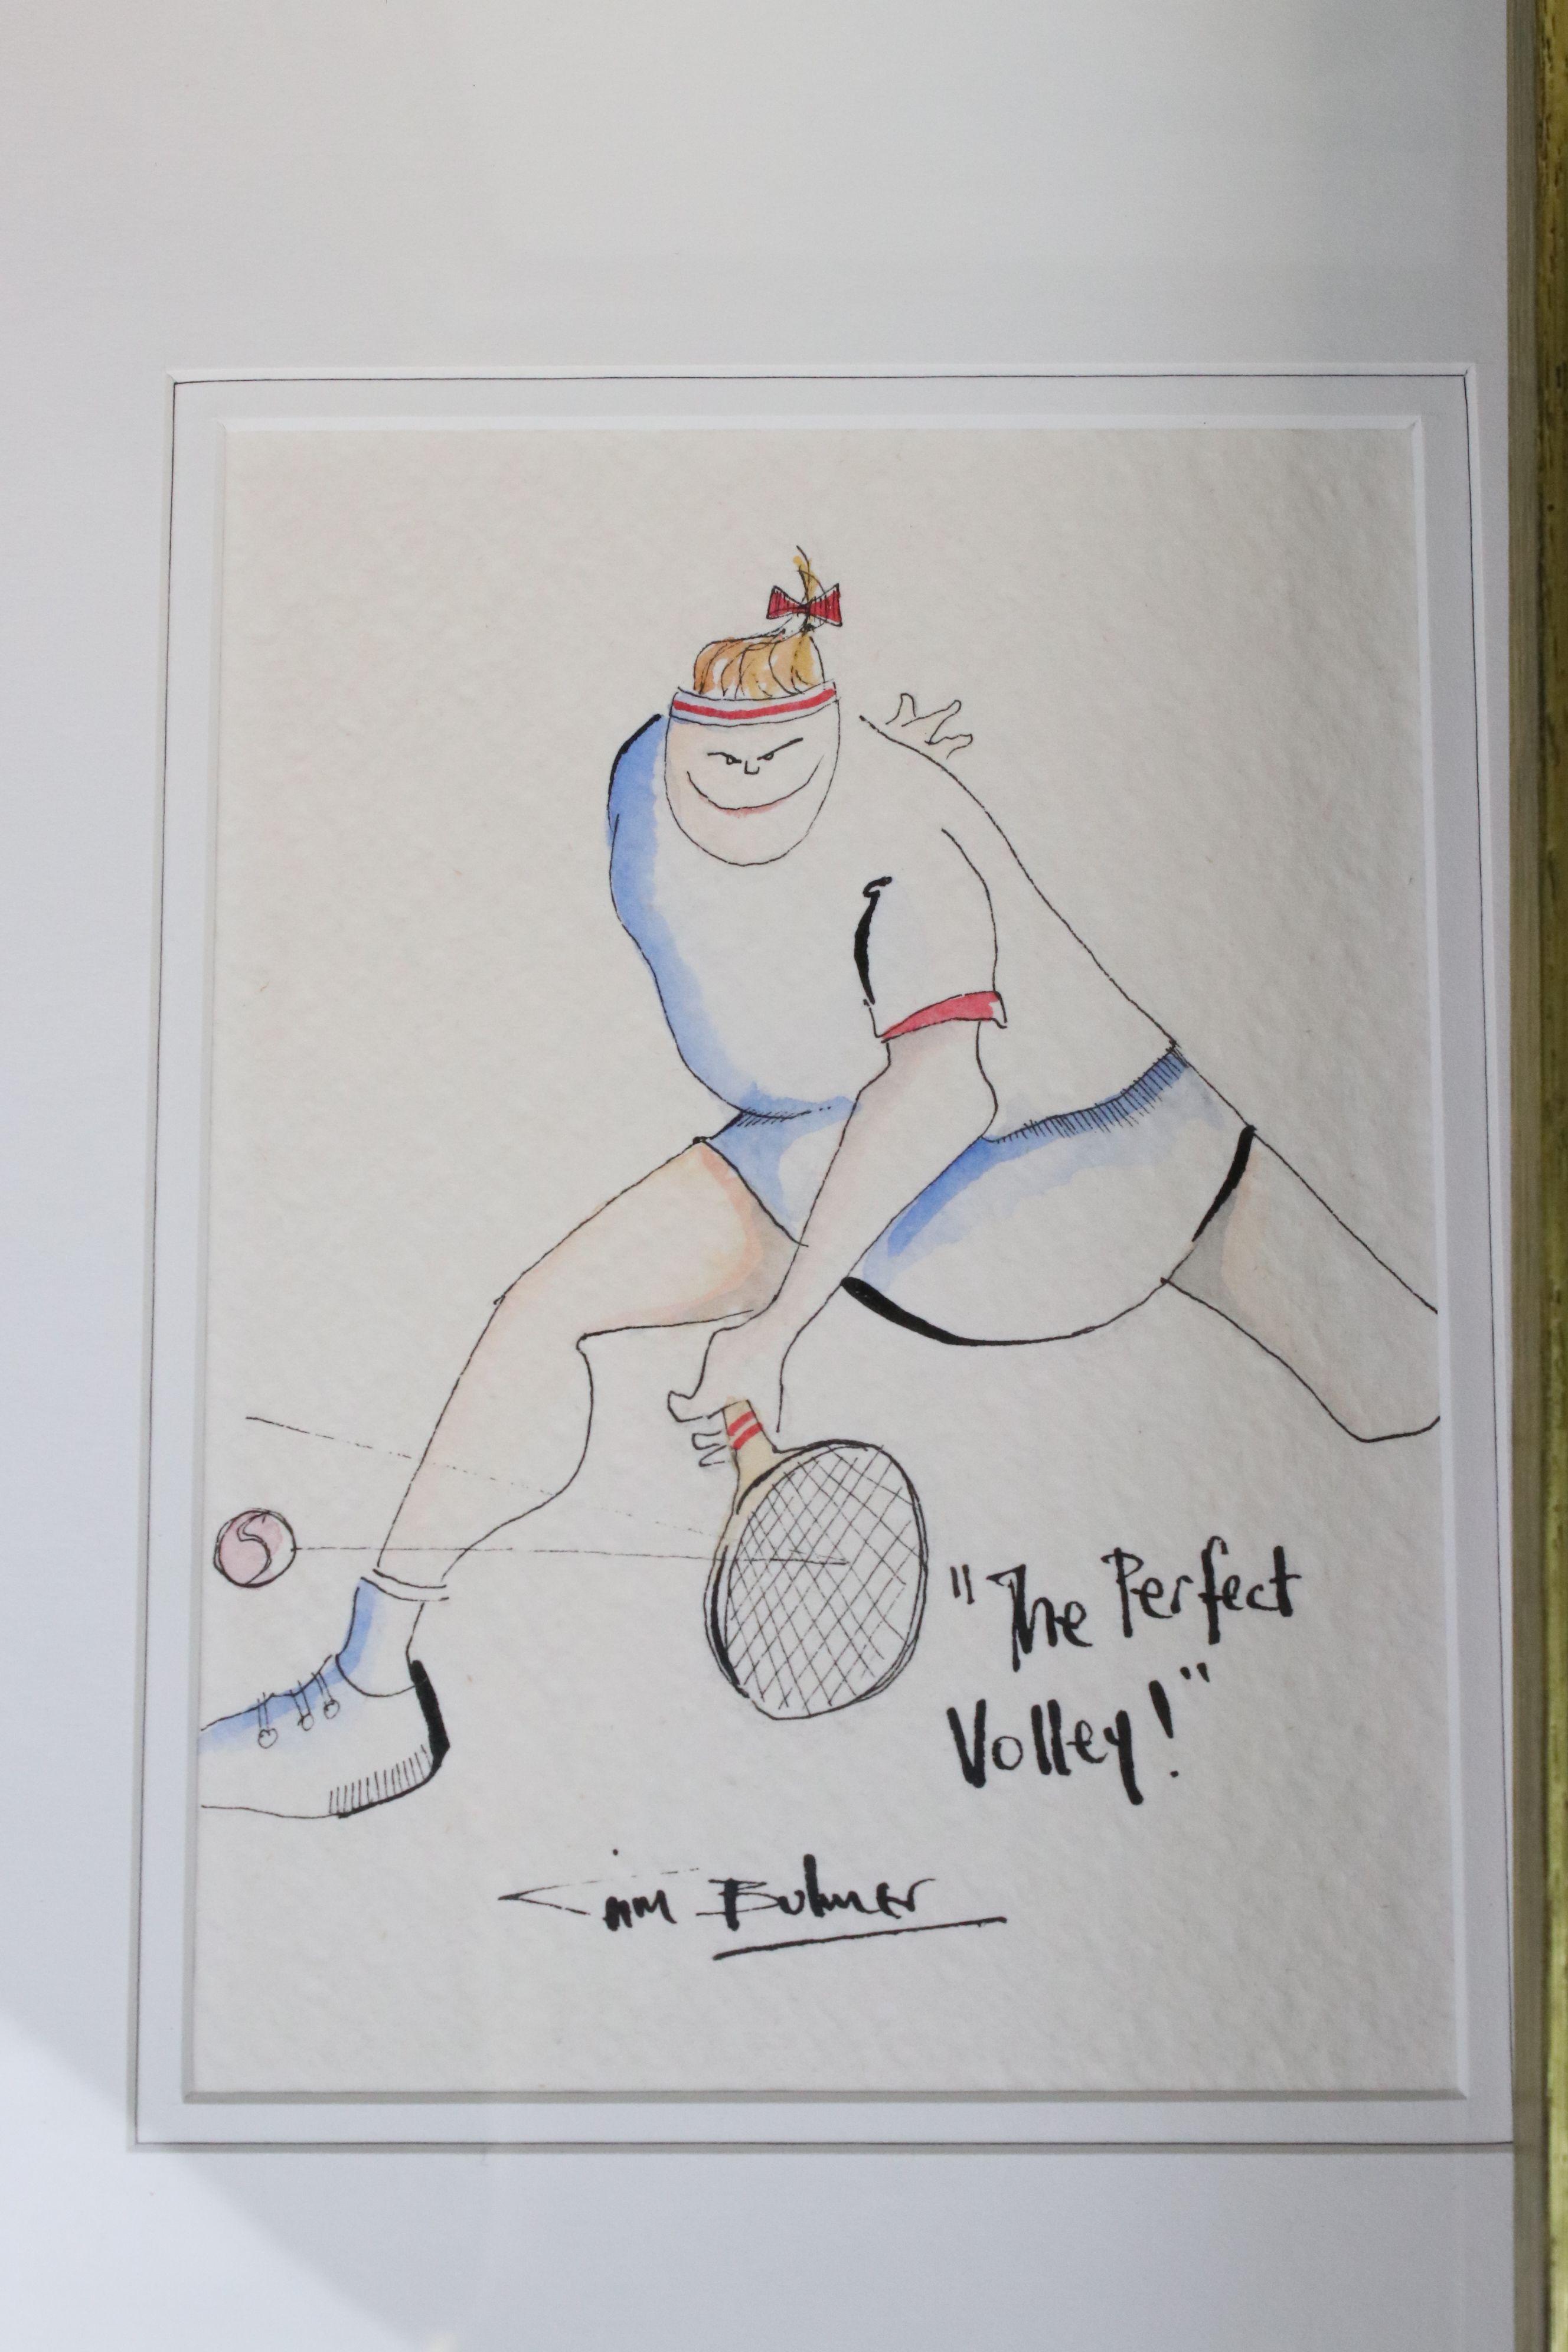 Tim Bulmer (cartoonist) a pair of humorous tennis watercolour cartoons & a signed Angela Fielder - Image 7 of 7